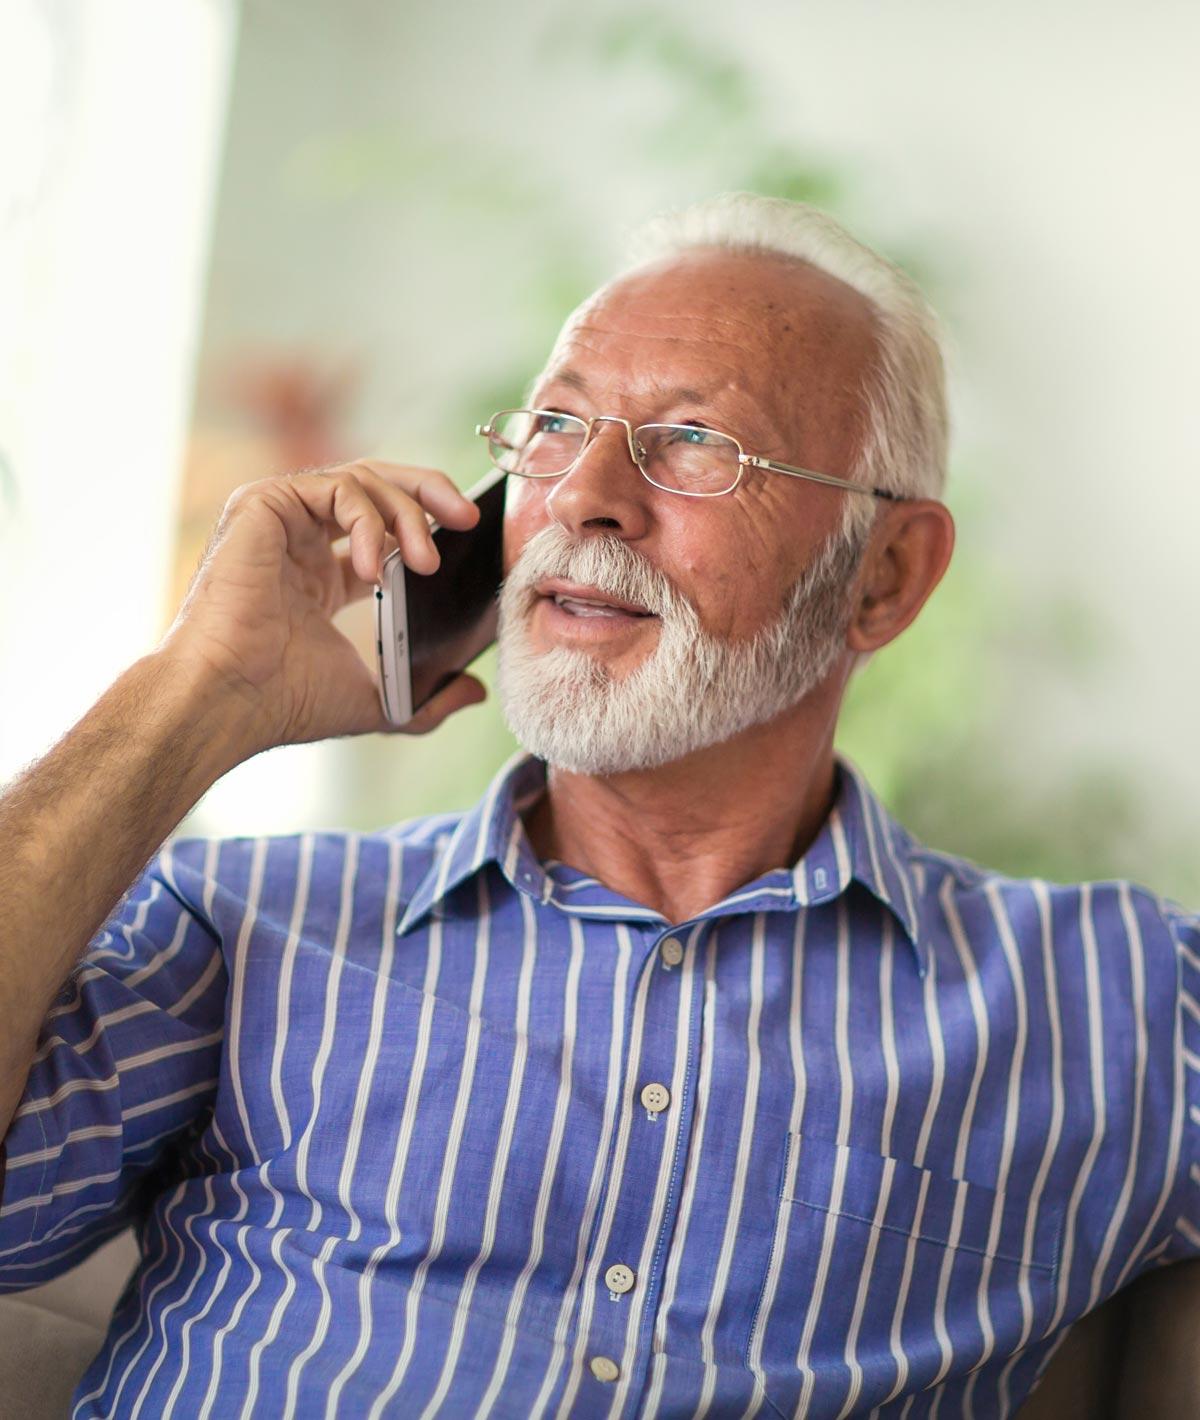 Senior Man on Mobile Phone